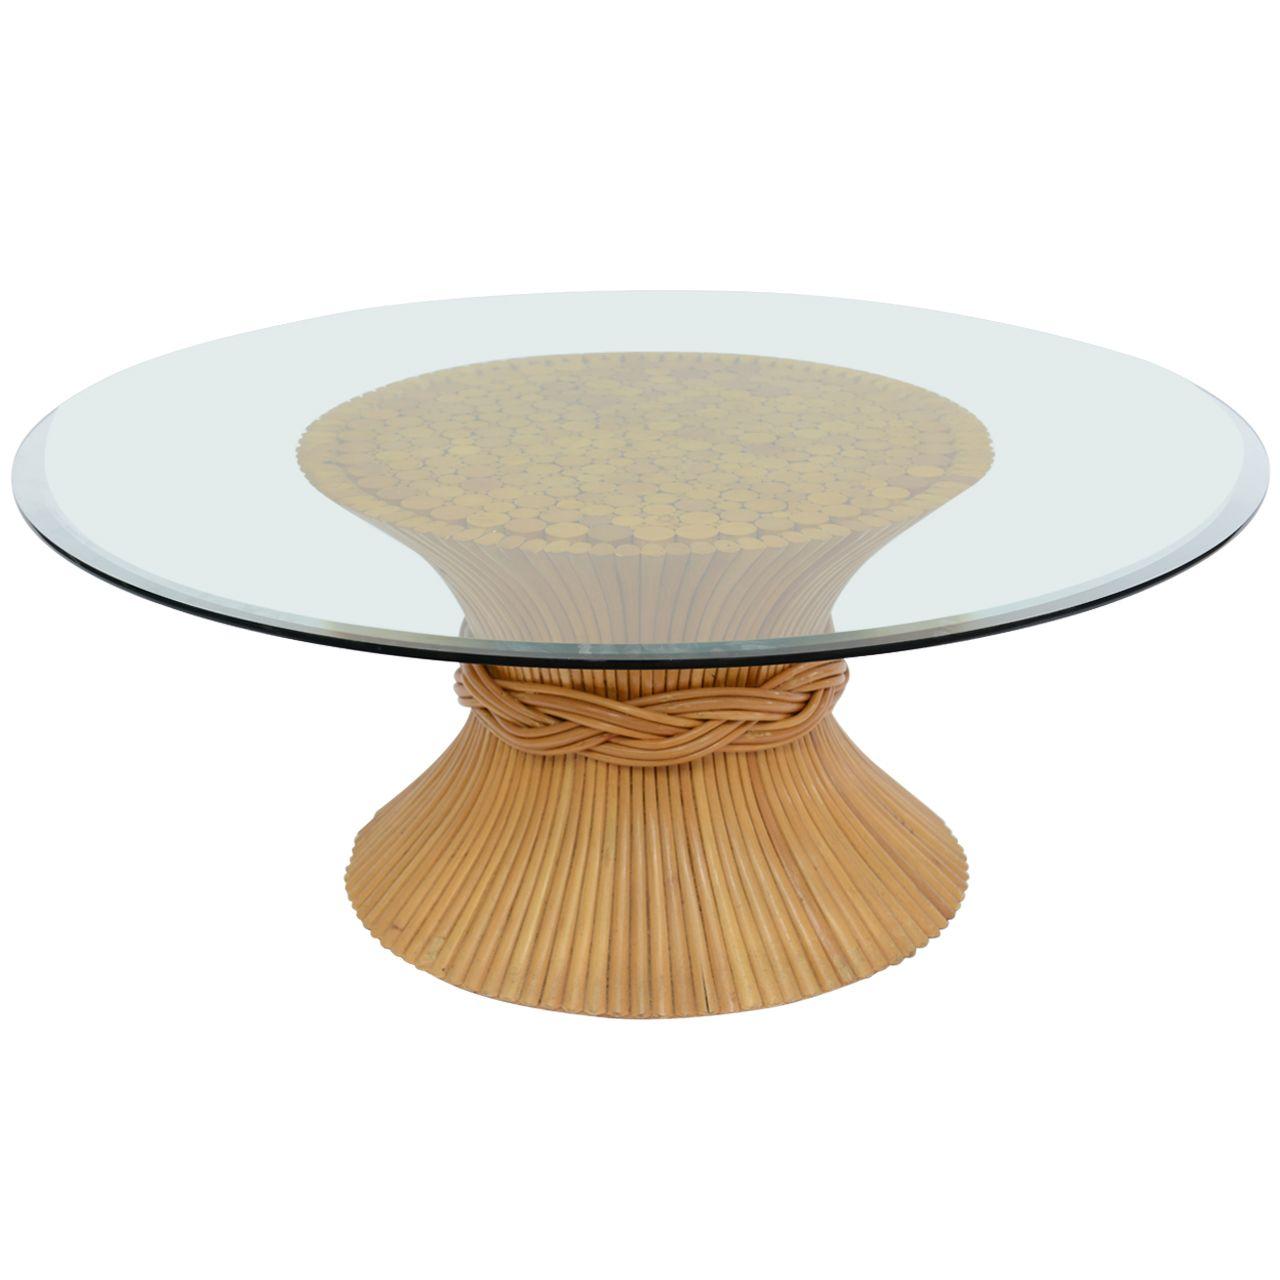 1stdibs.com | Vintage McGuire Sheaf Of Wheat Rattan Coffee Table